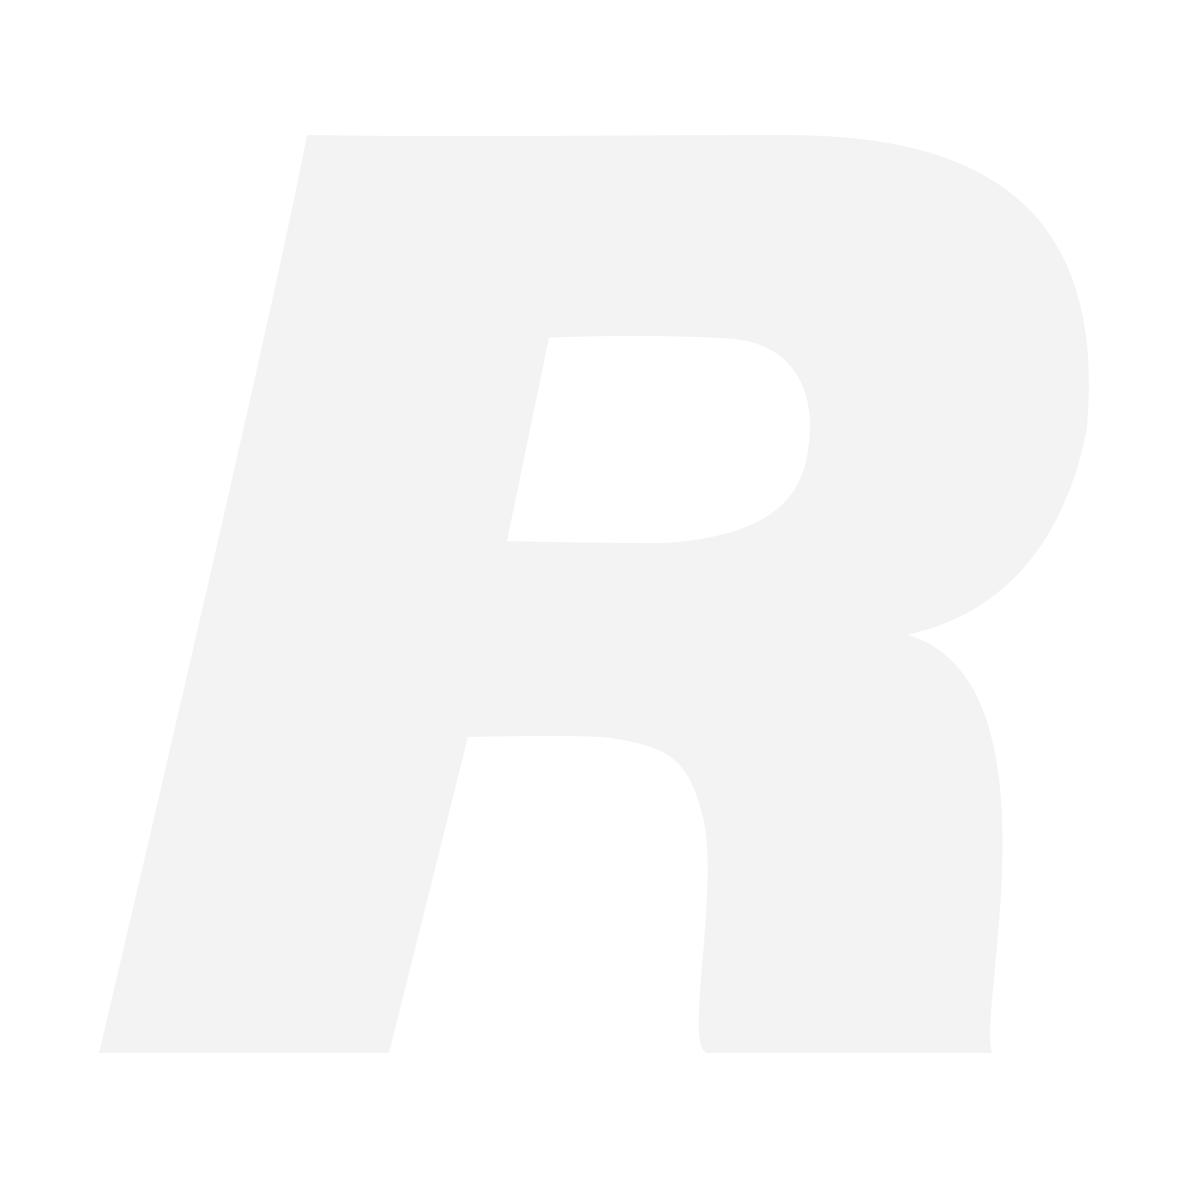 Köp Sony A7R Mark III, byt in din gamla Canon EOS 6D Mark II